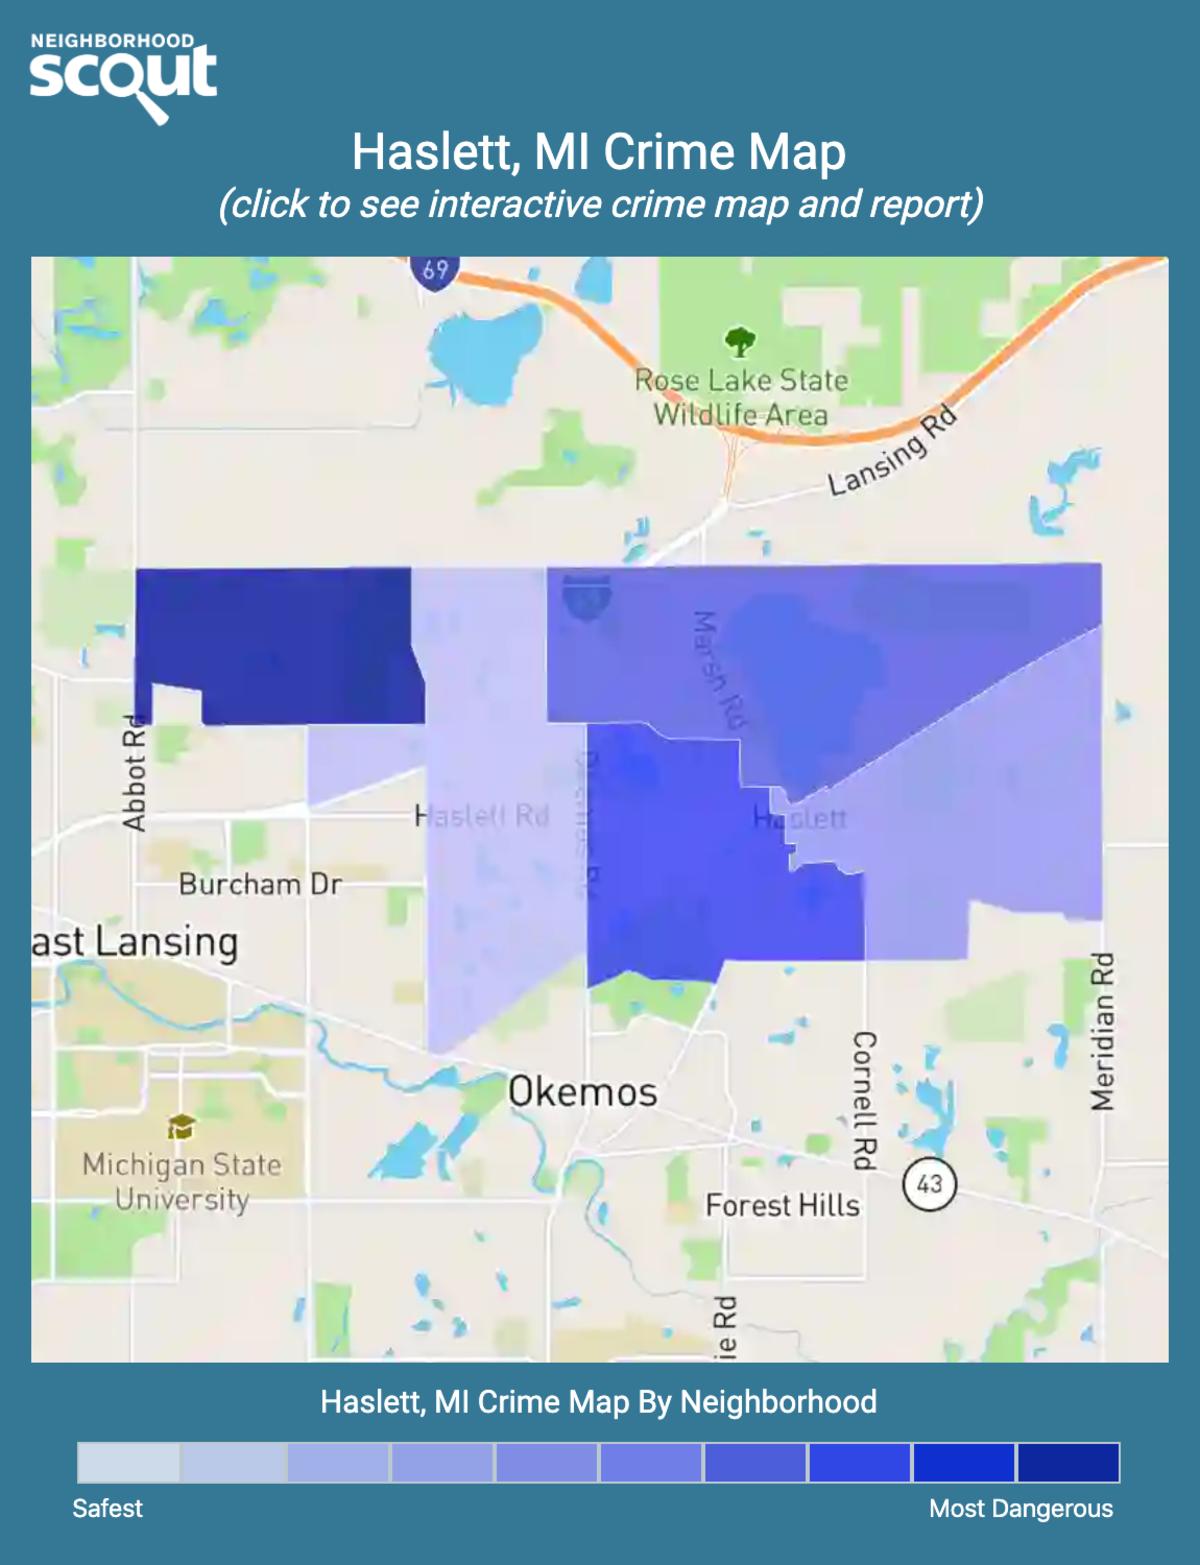 Haslett, Michigan crime map